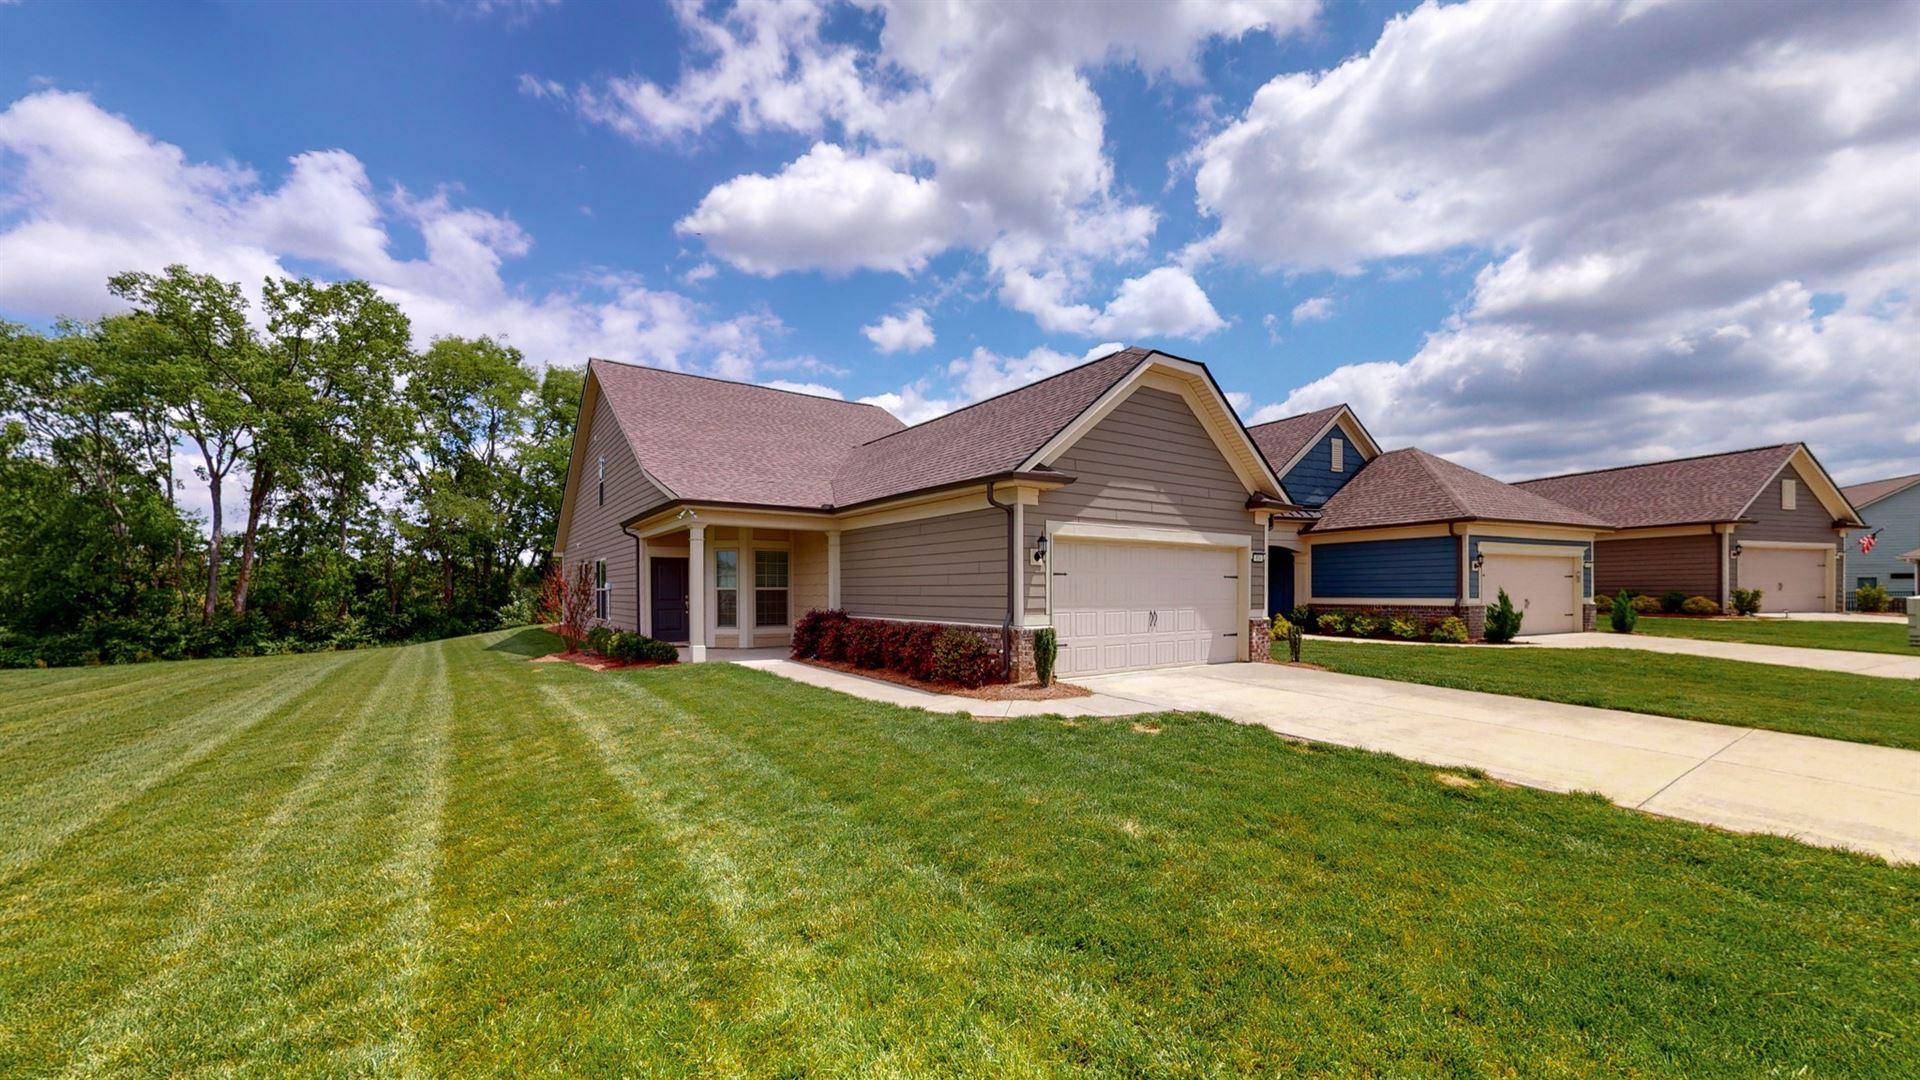 854 Clay Pl, Spring Hill, TN 37174 - MLS#: 2142418